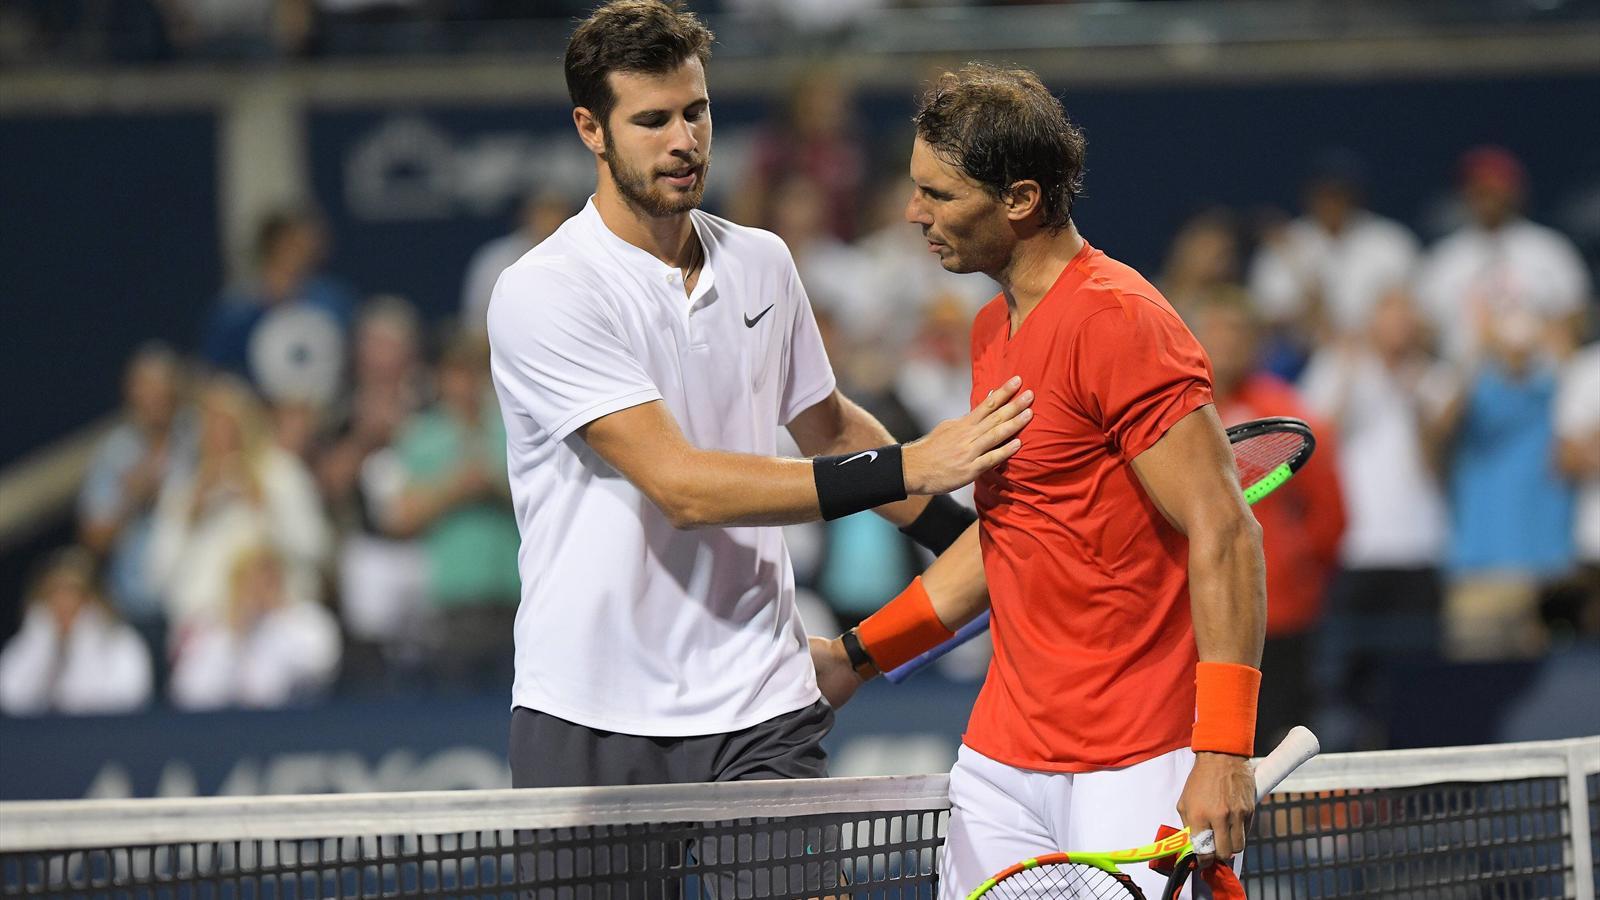 Теннис. Ставки на теннис. Монреаль, ATP. Торонто, WTA. 12 Финала. 15 Августа 2015